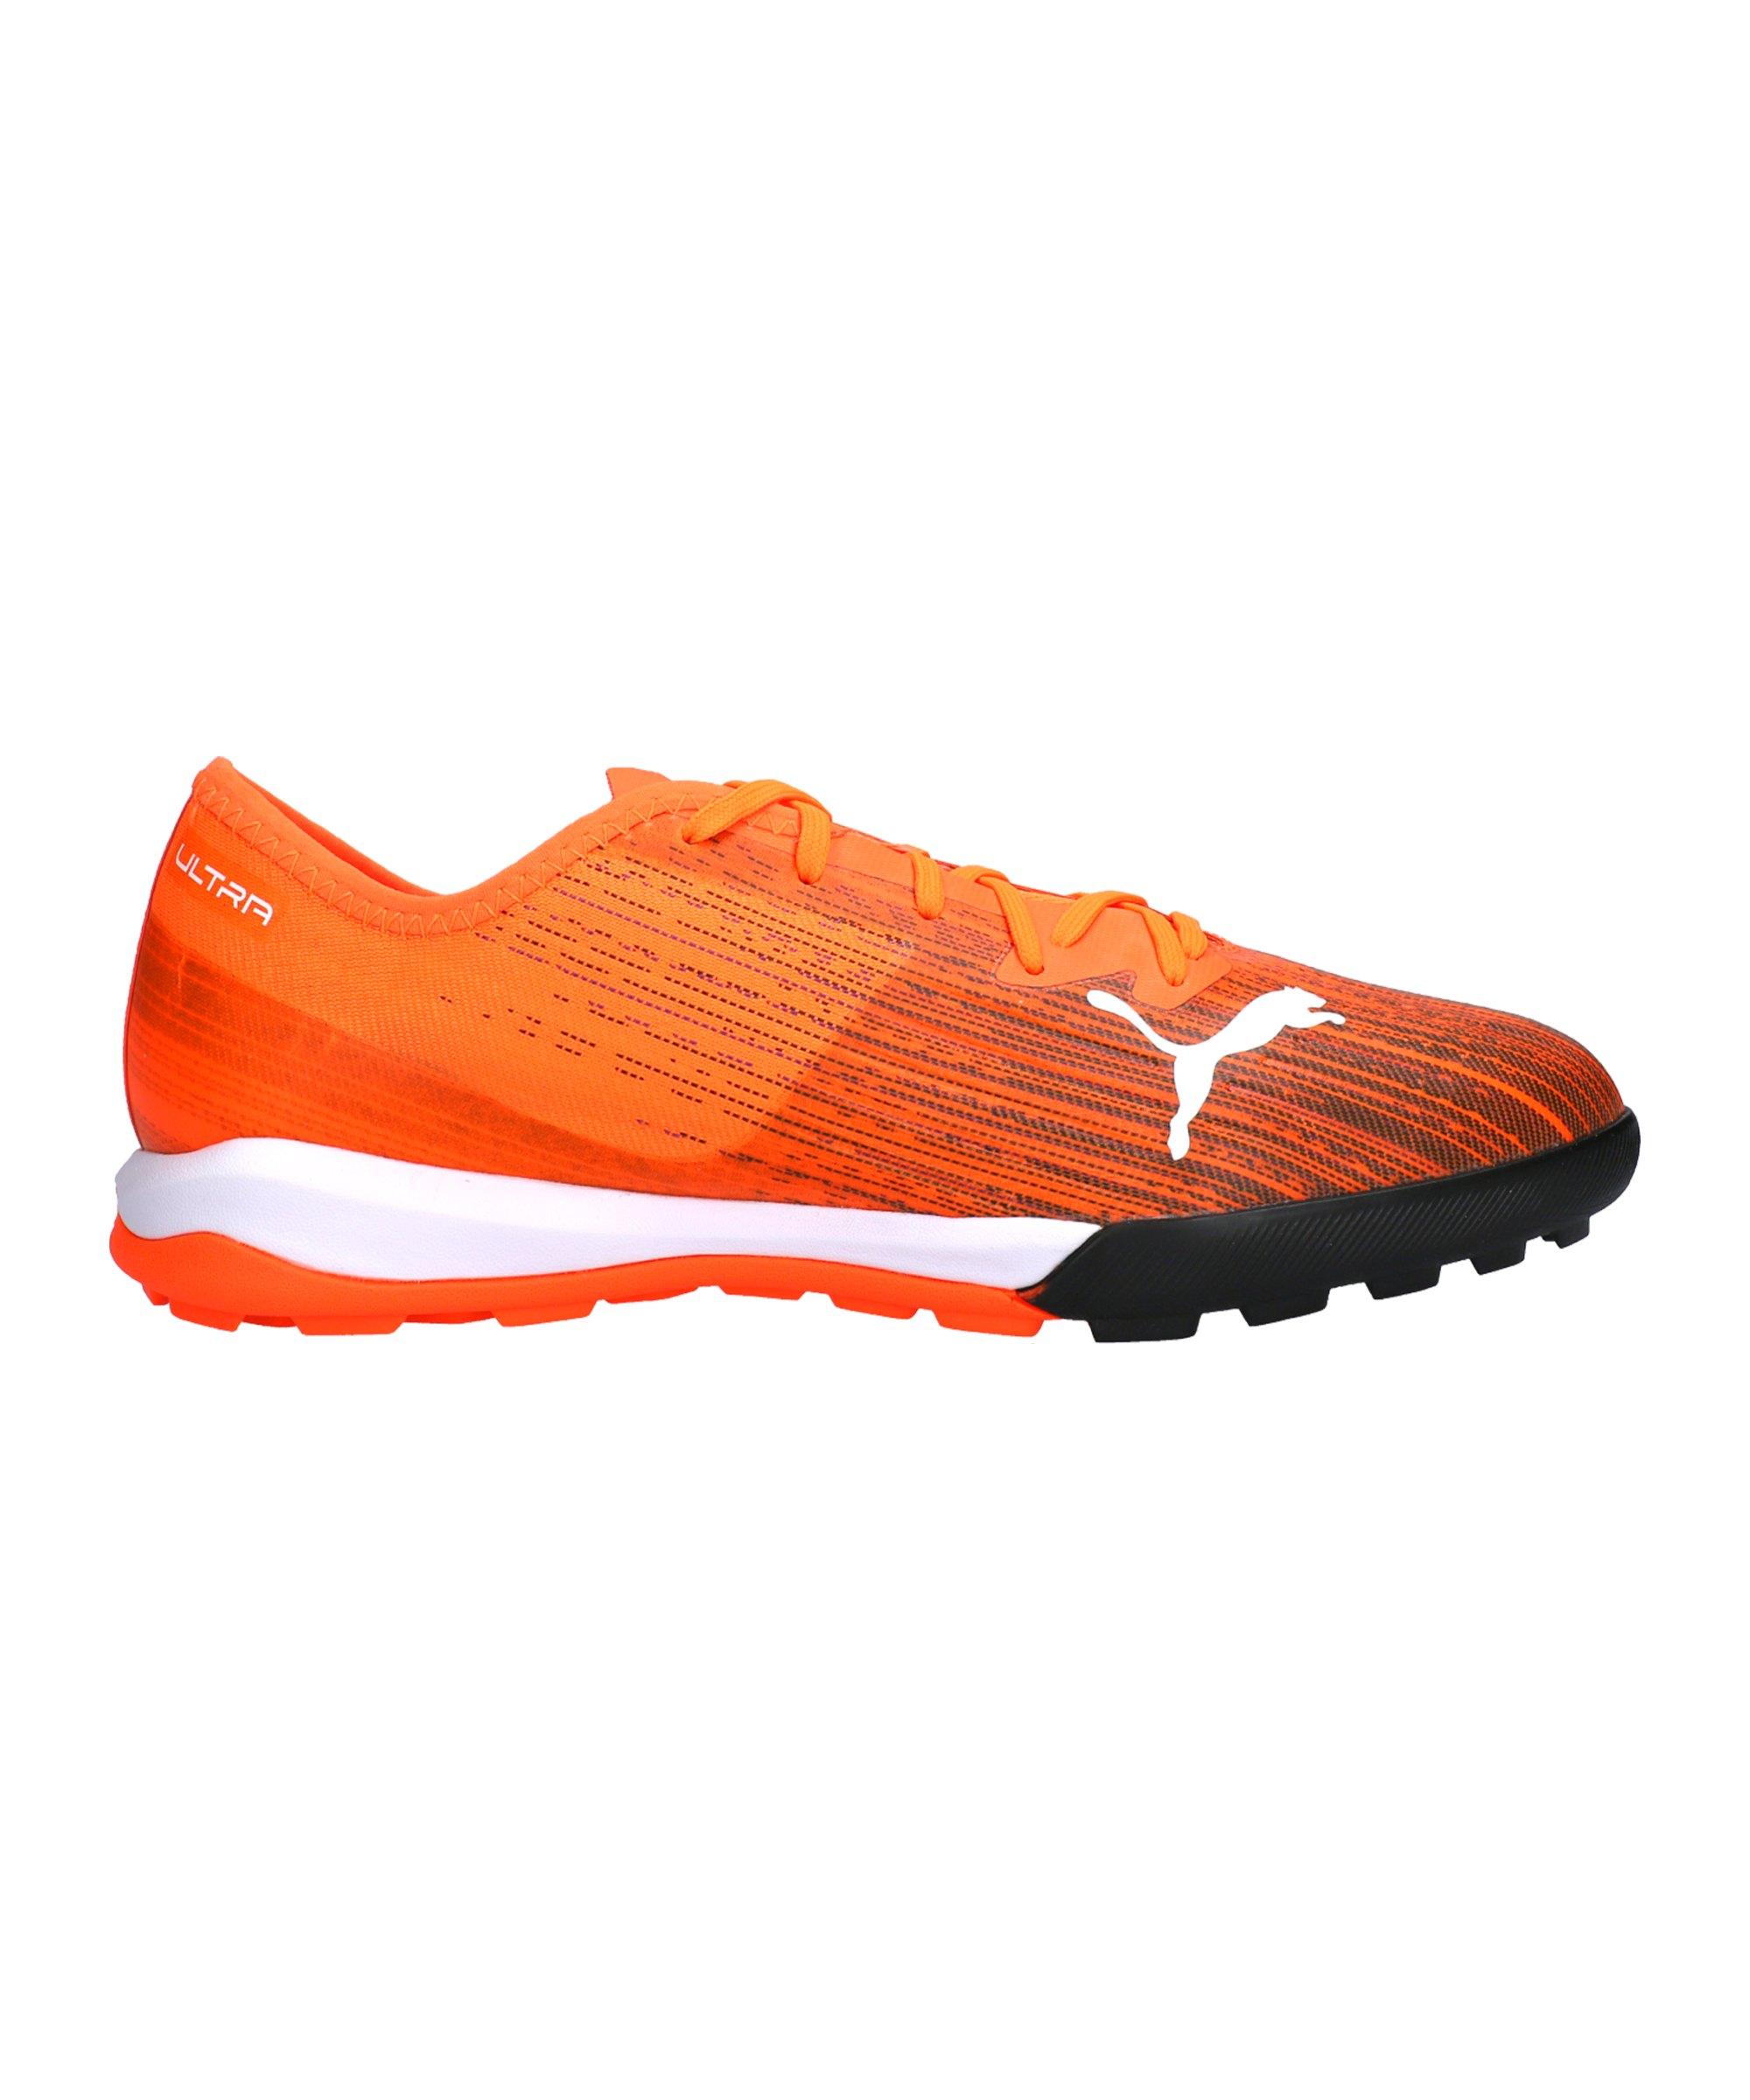 PUMA ULTRA Chasing Adrenaline 2.1 TT Turf Orange F01 - orange